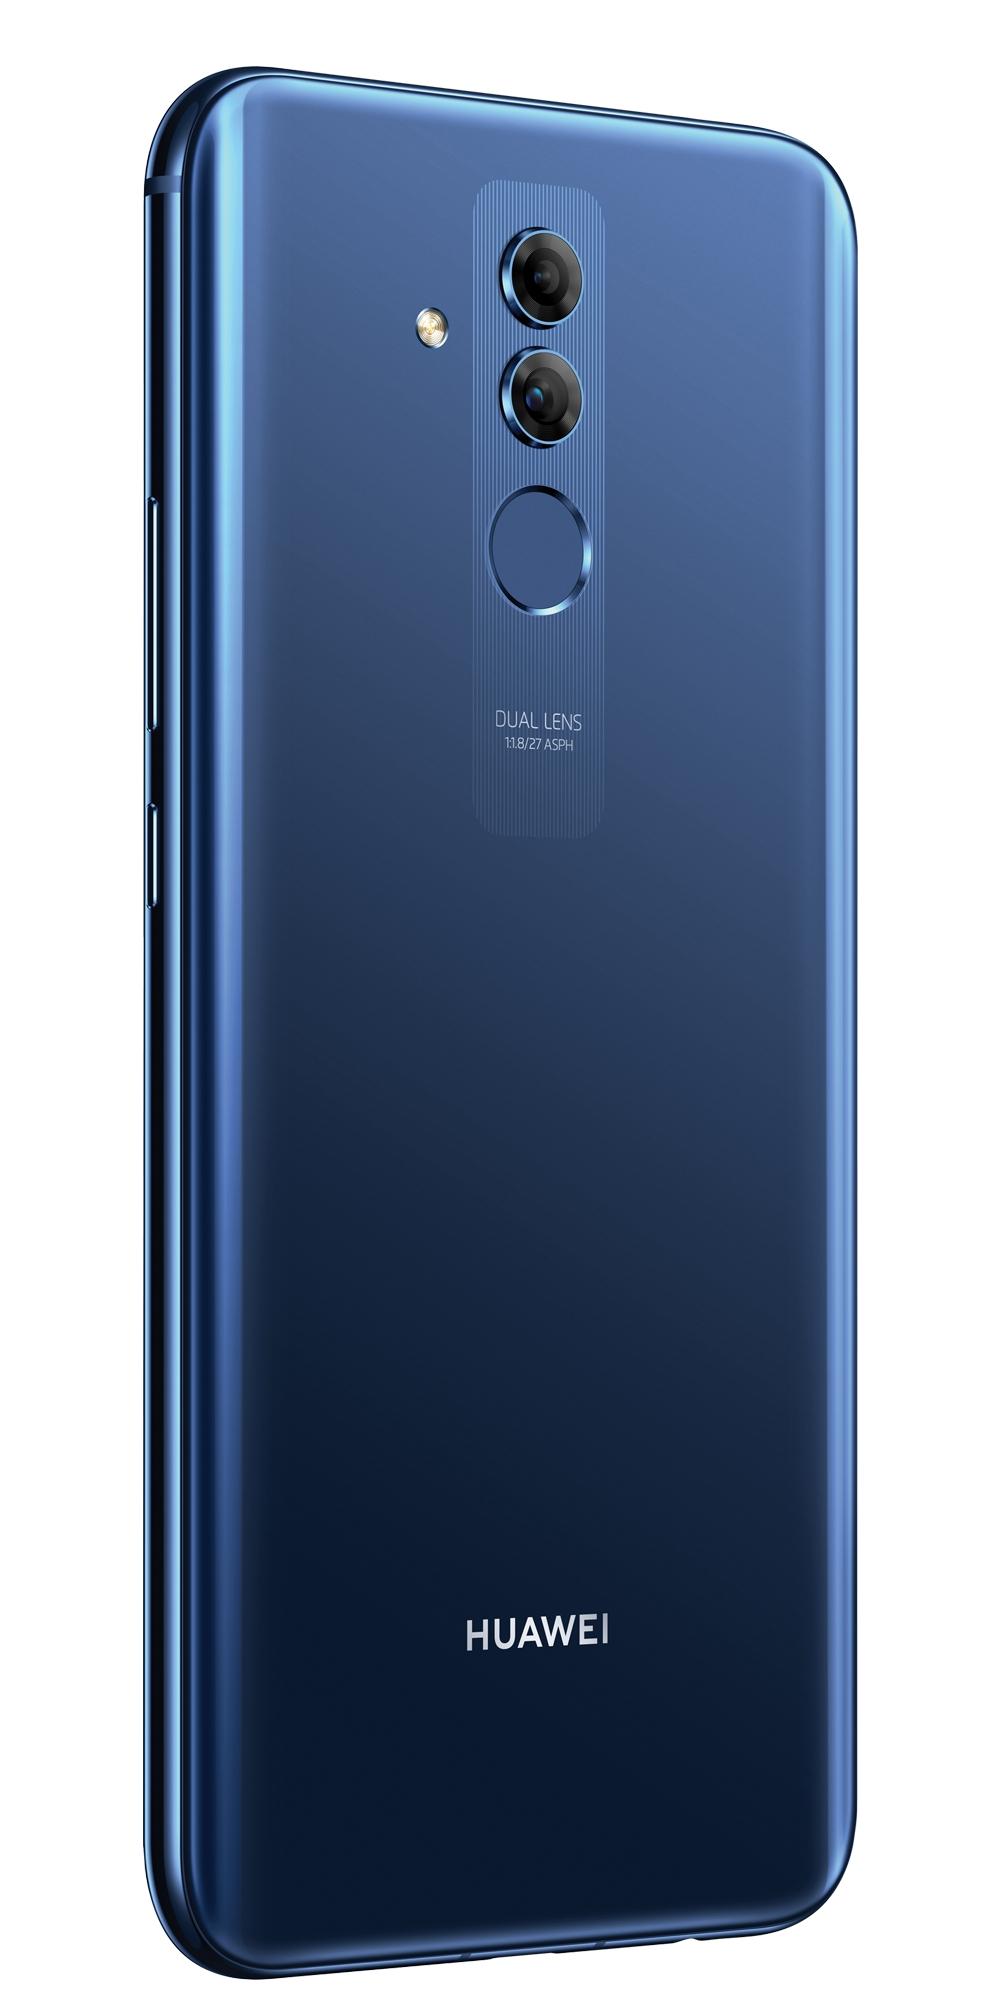 Huawei Mate 20 Lite Back Dual Lens